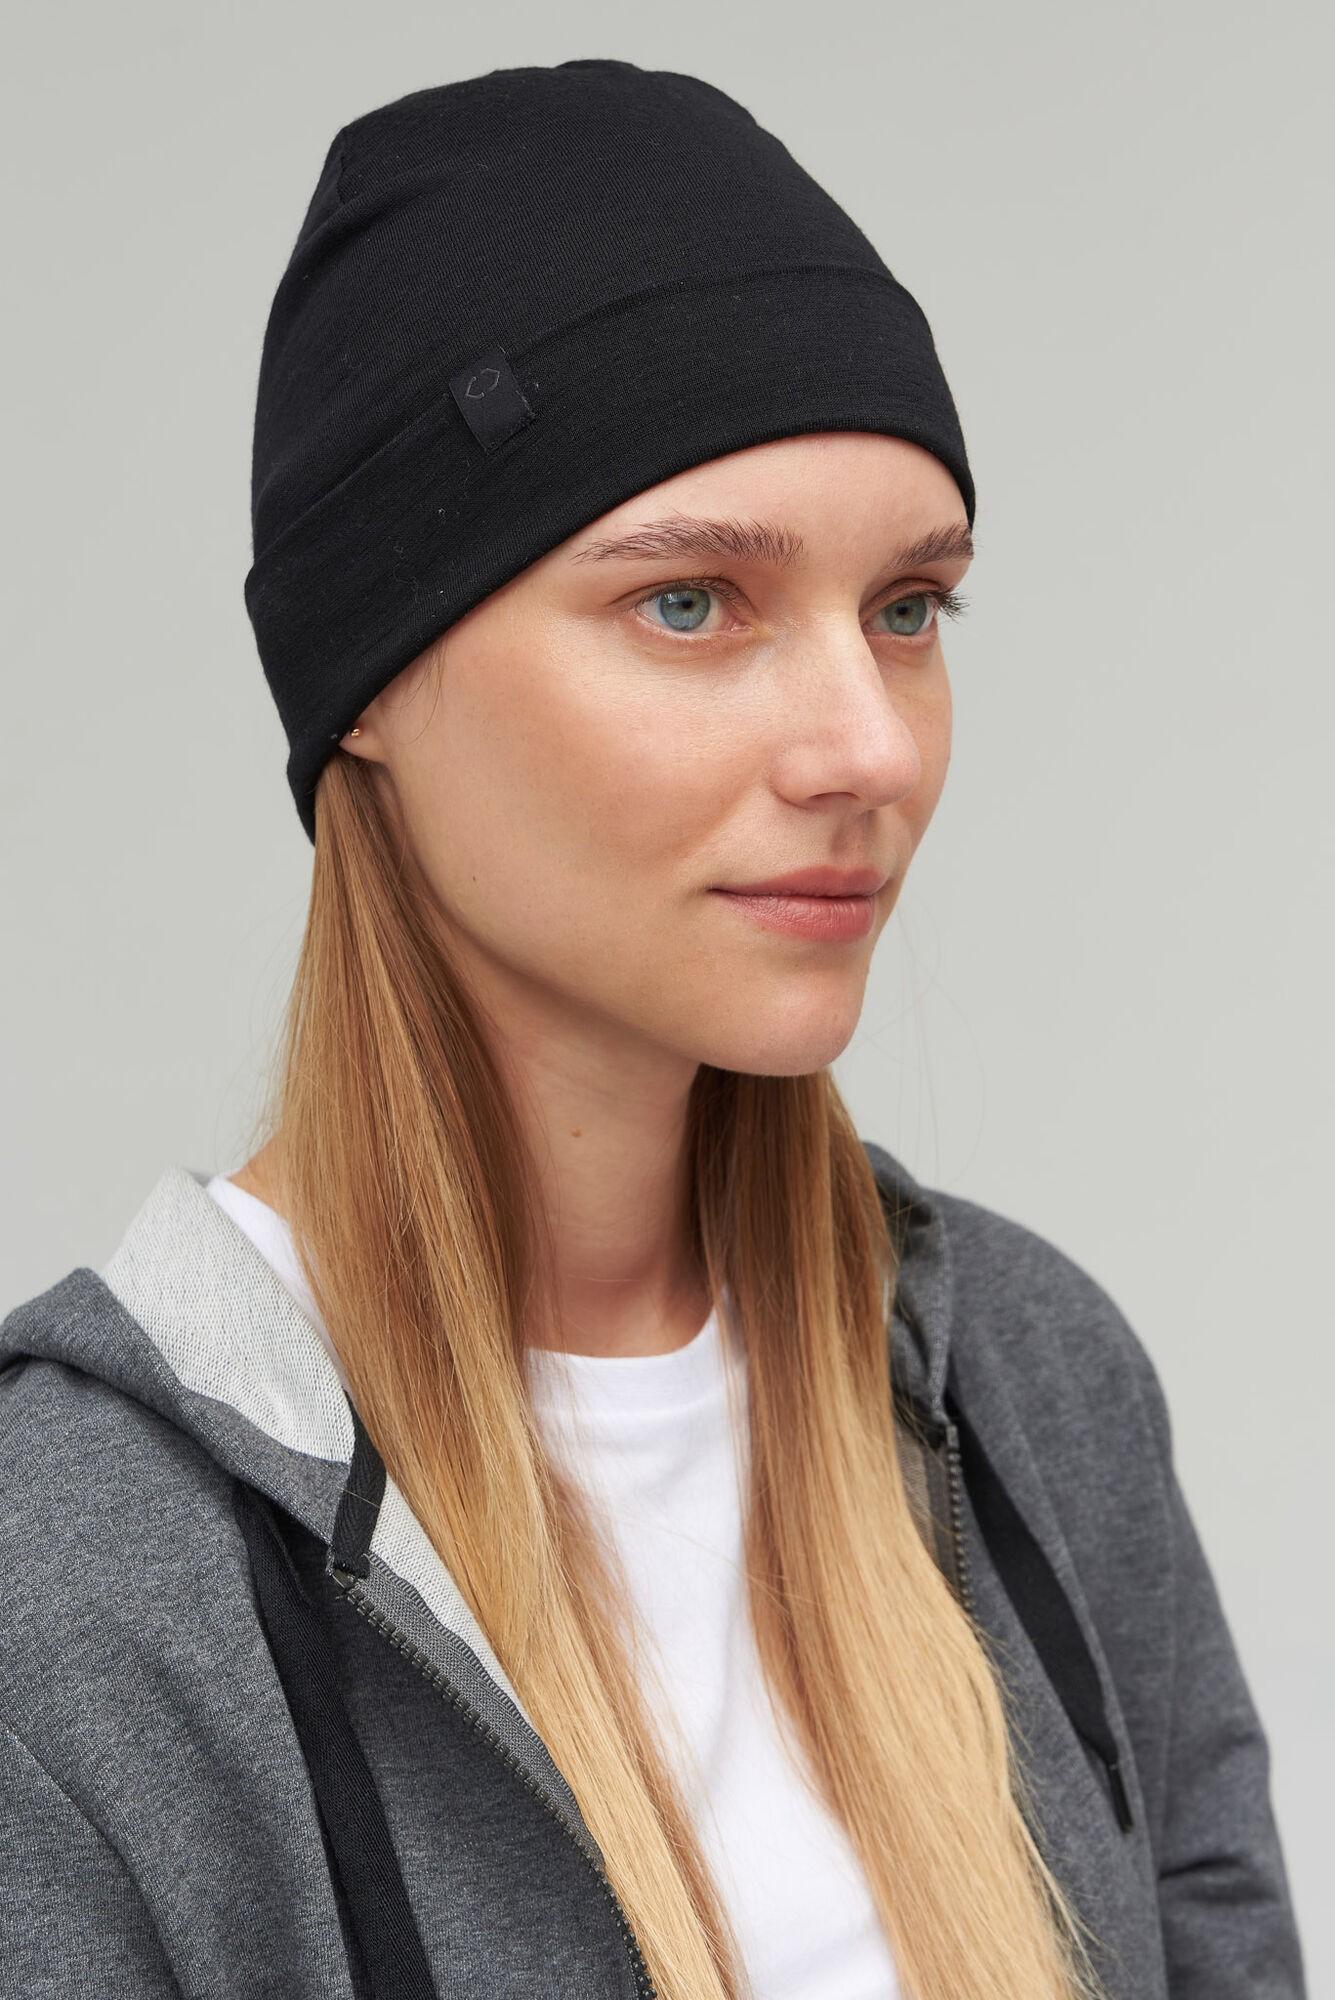 AUDIMAS BEANIE merino vilnos kepurė NOS 1-06-294 Black One Size